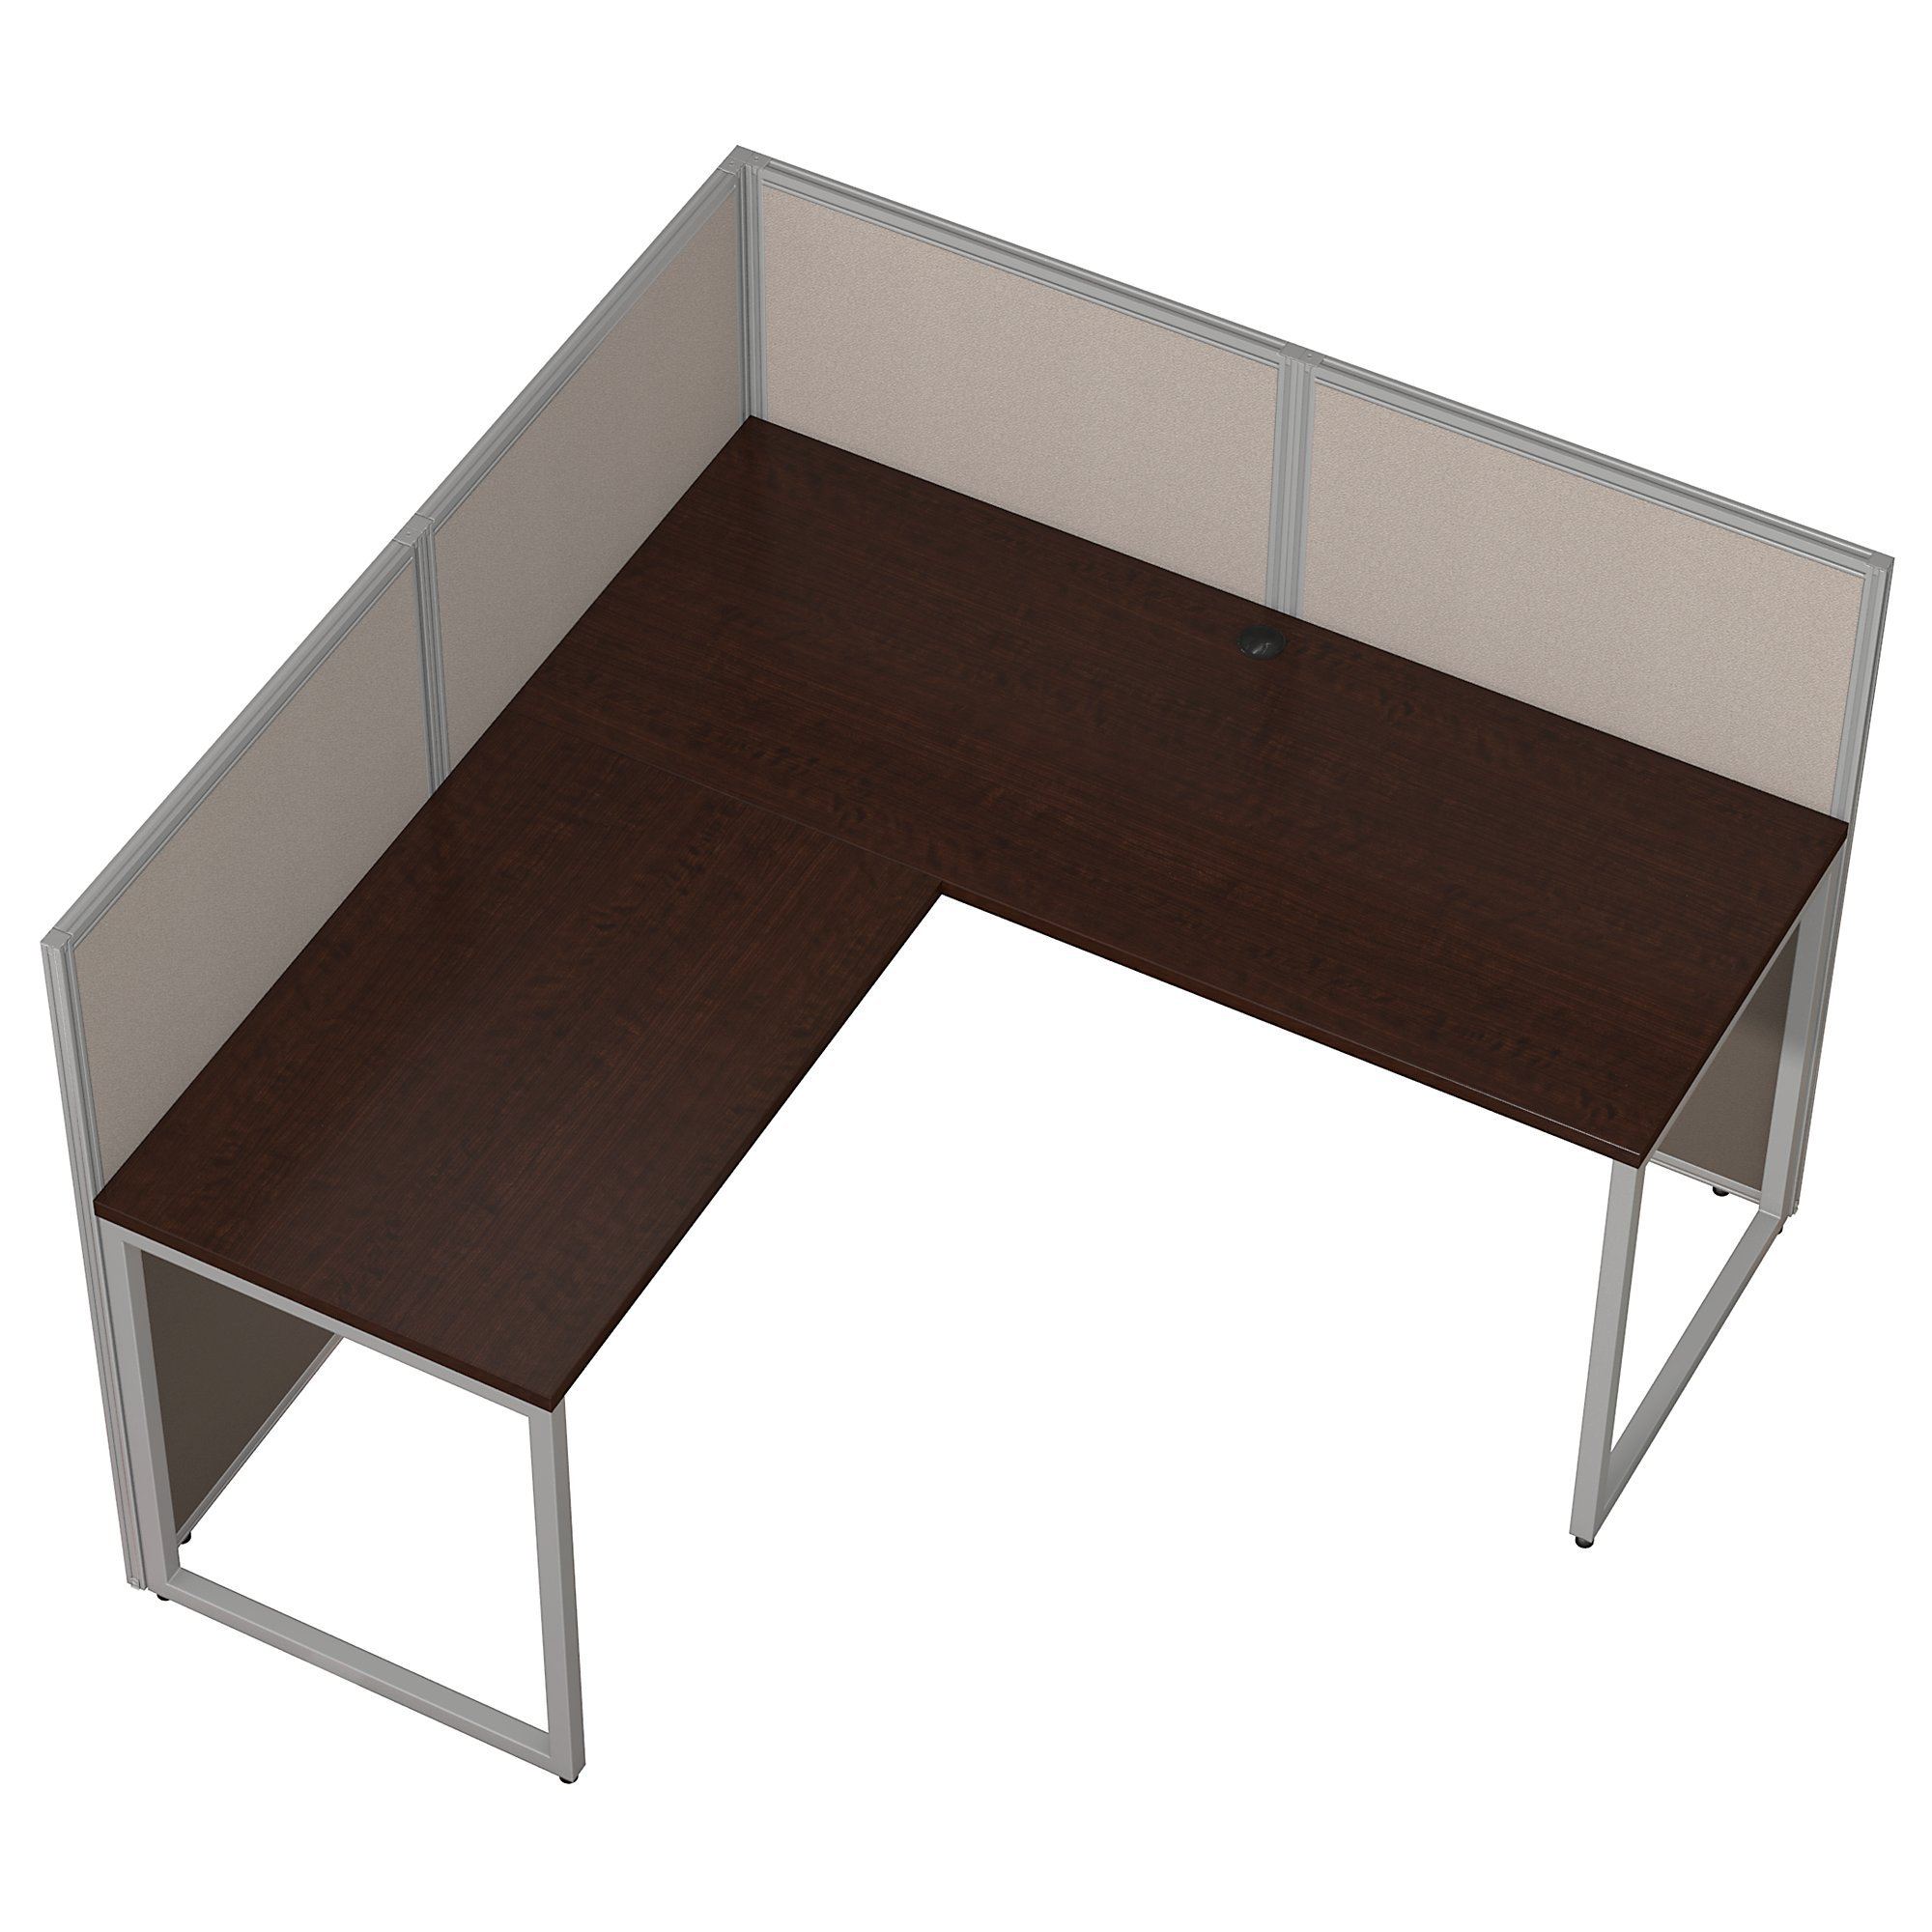 Bush Business Furniture Easy Office 60W L Shaped Desk Open Office in Mocha Cherry by Bush Business Furniture (Image #3)